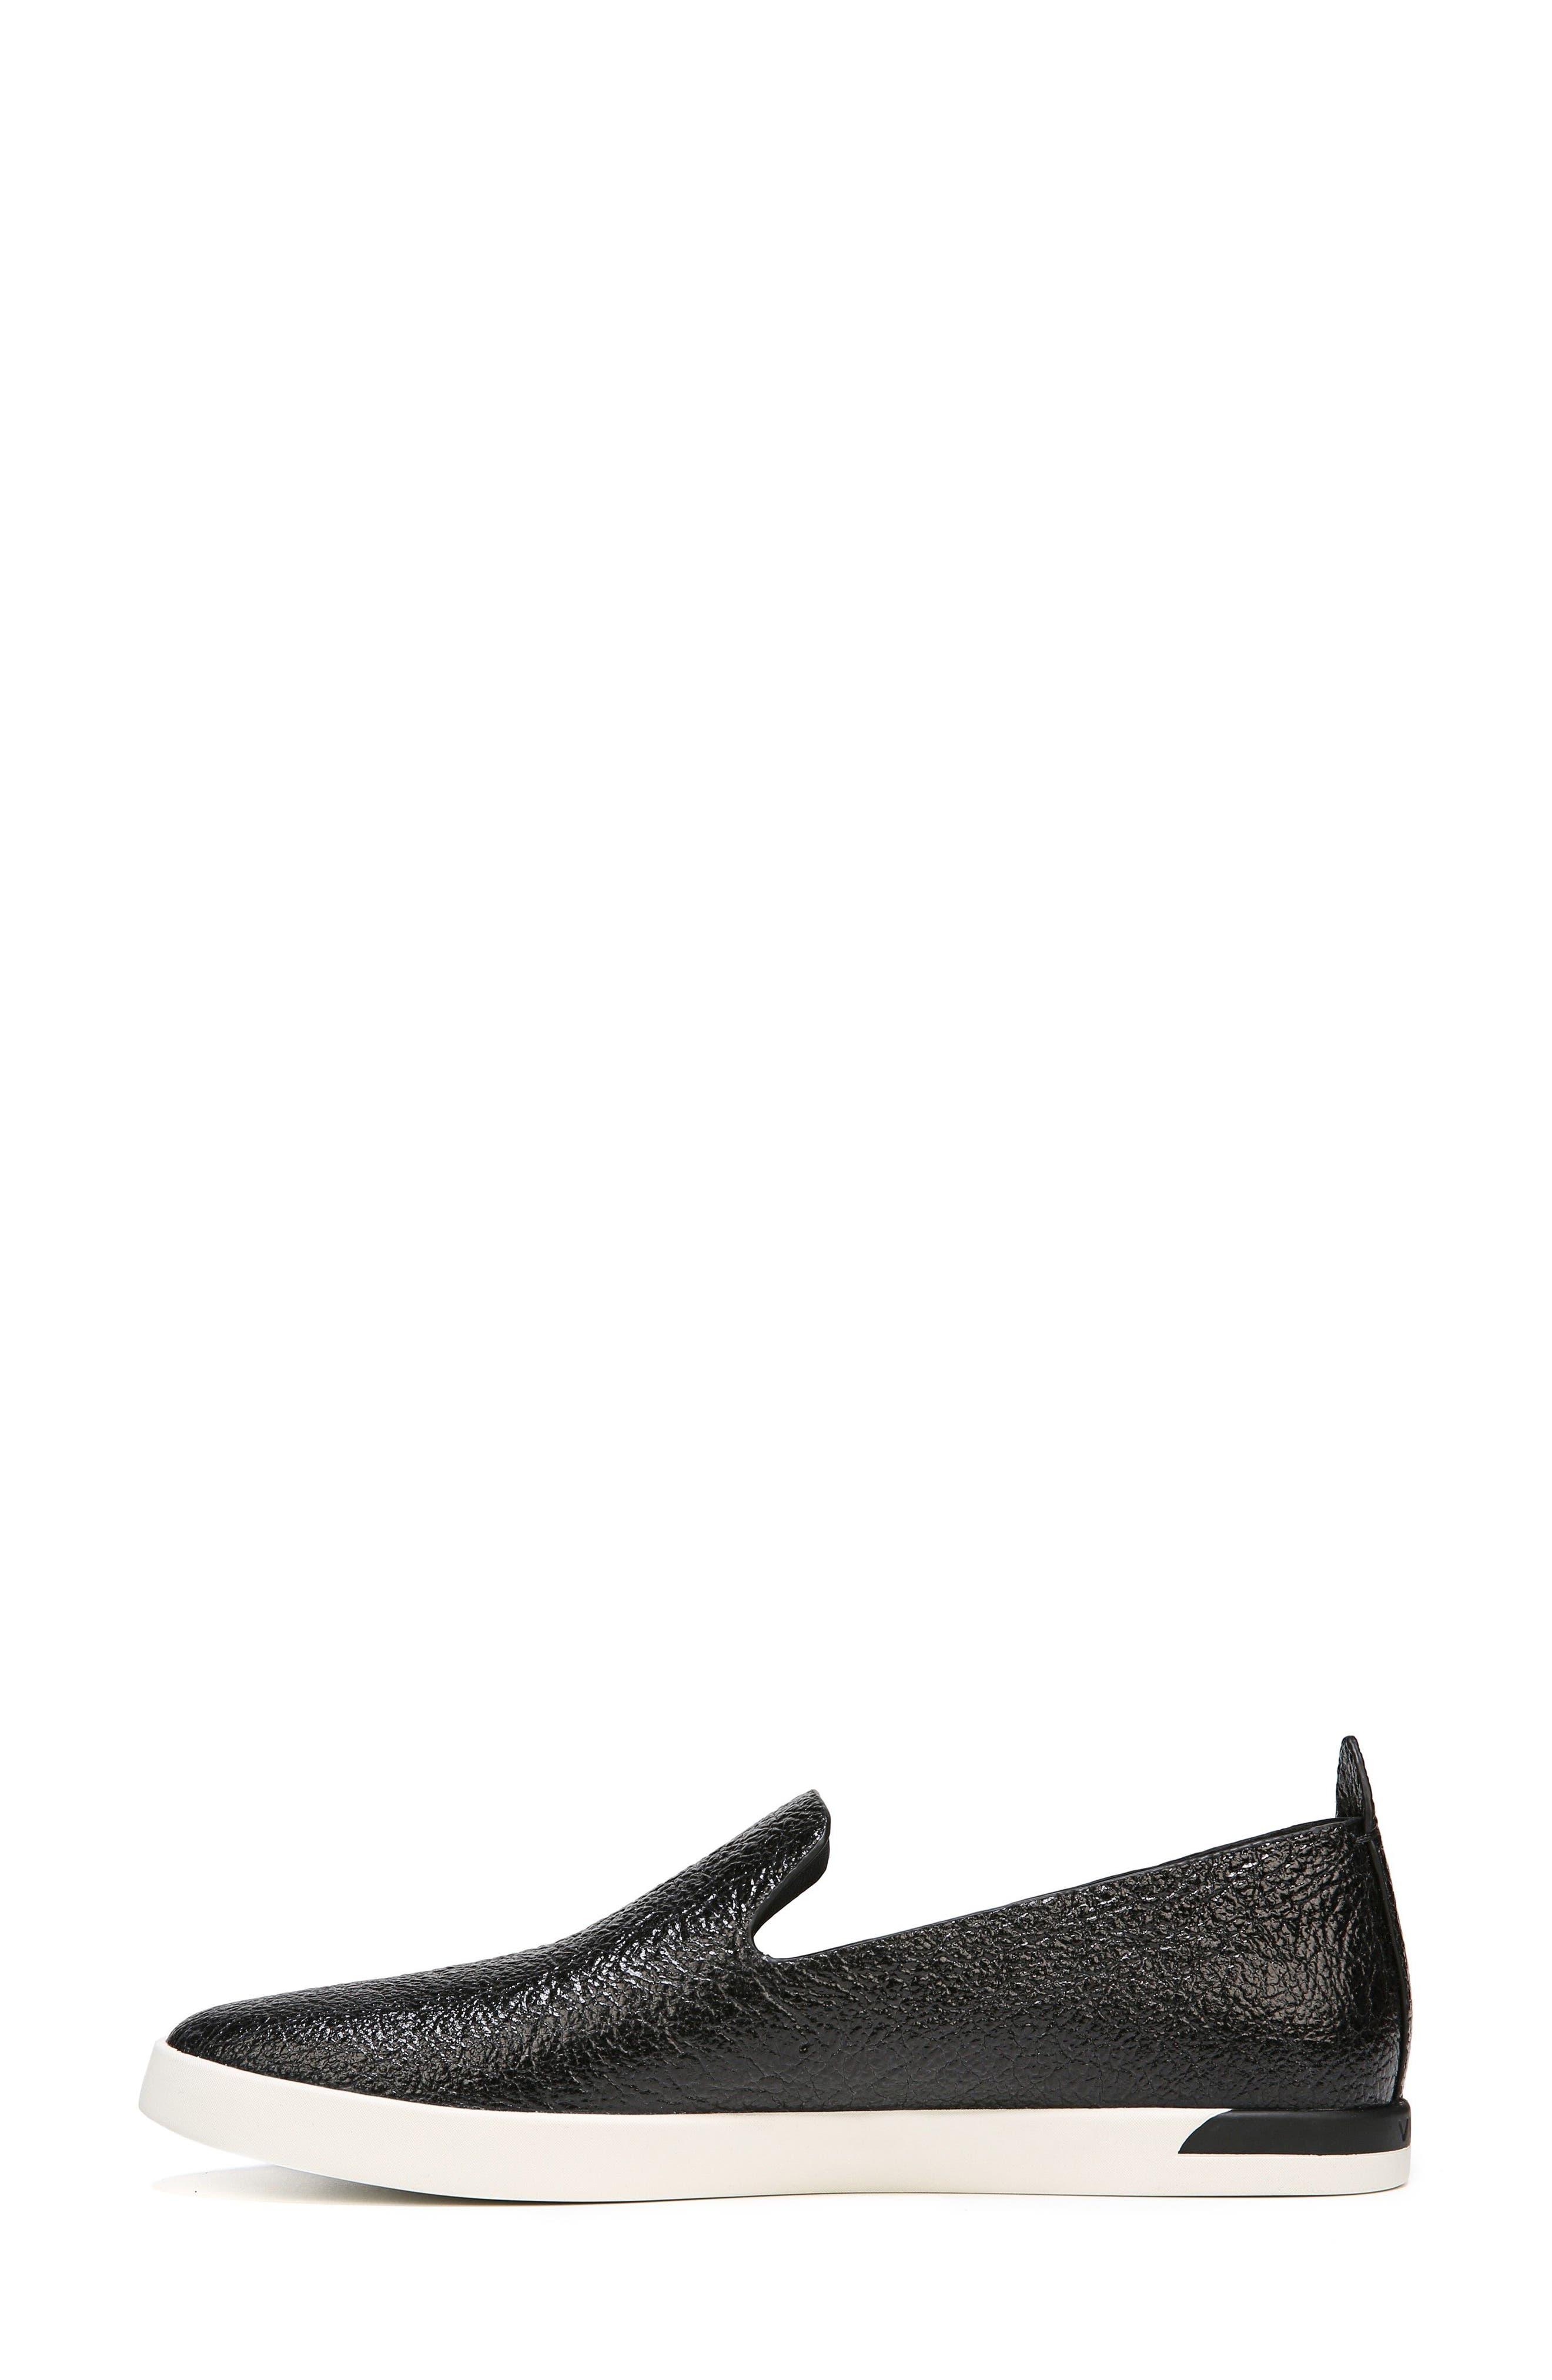 Vero Sneaker,                             Alternate thumbnail 7, color,                             003